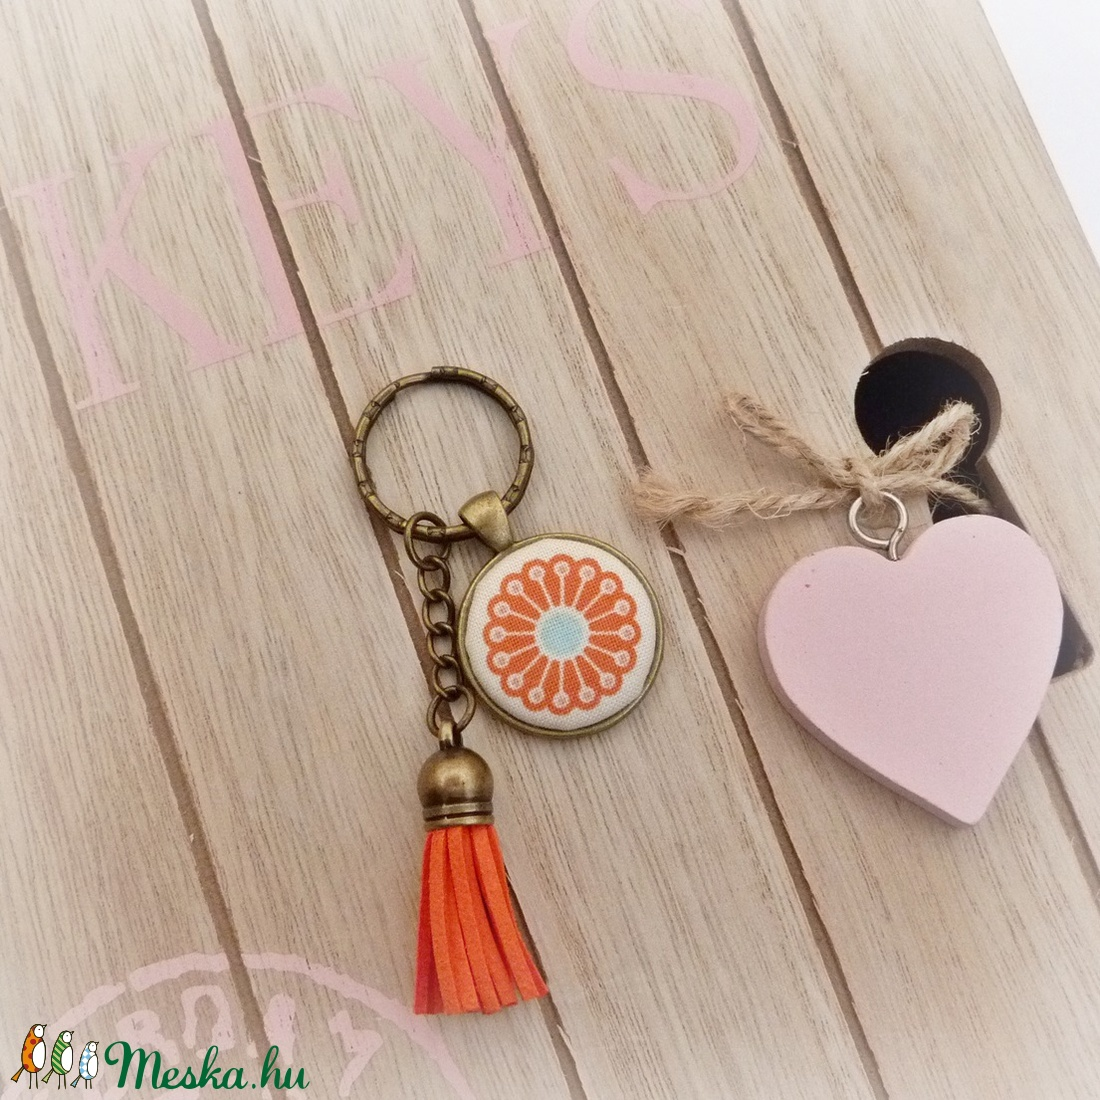 Narancsvirág - textilgombos kulcstartó  (Gubancbolt) - Meska.hu